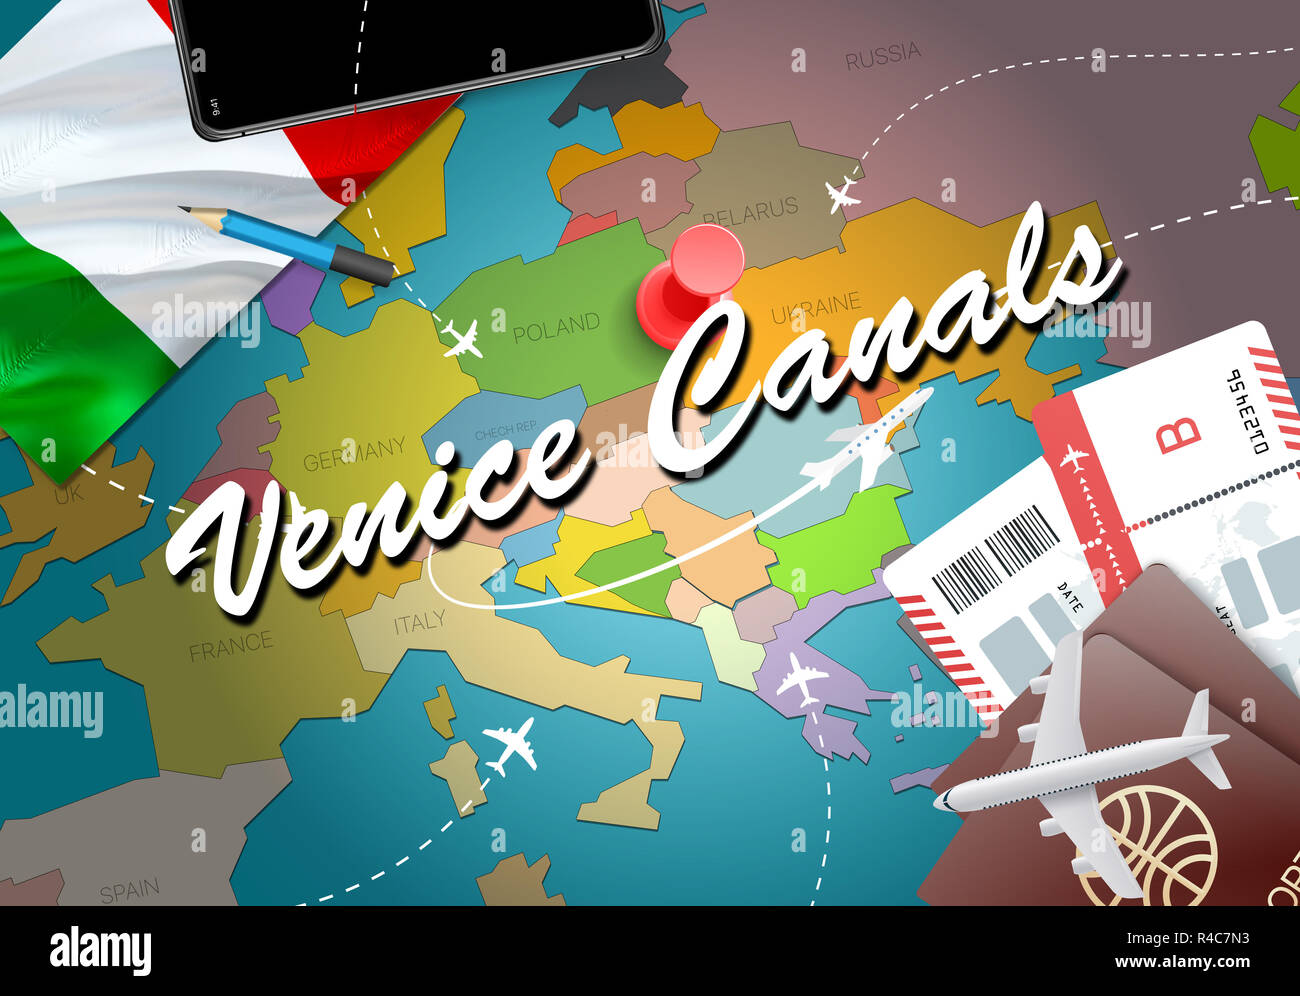 Venedig Kanale Stadt Reisen Und Tourismus Ziel Konzept Italien